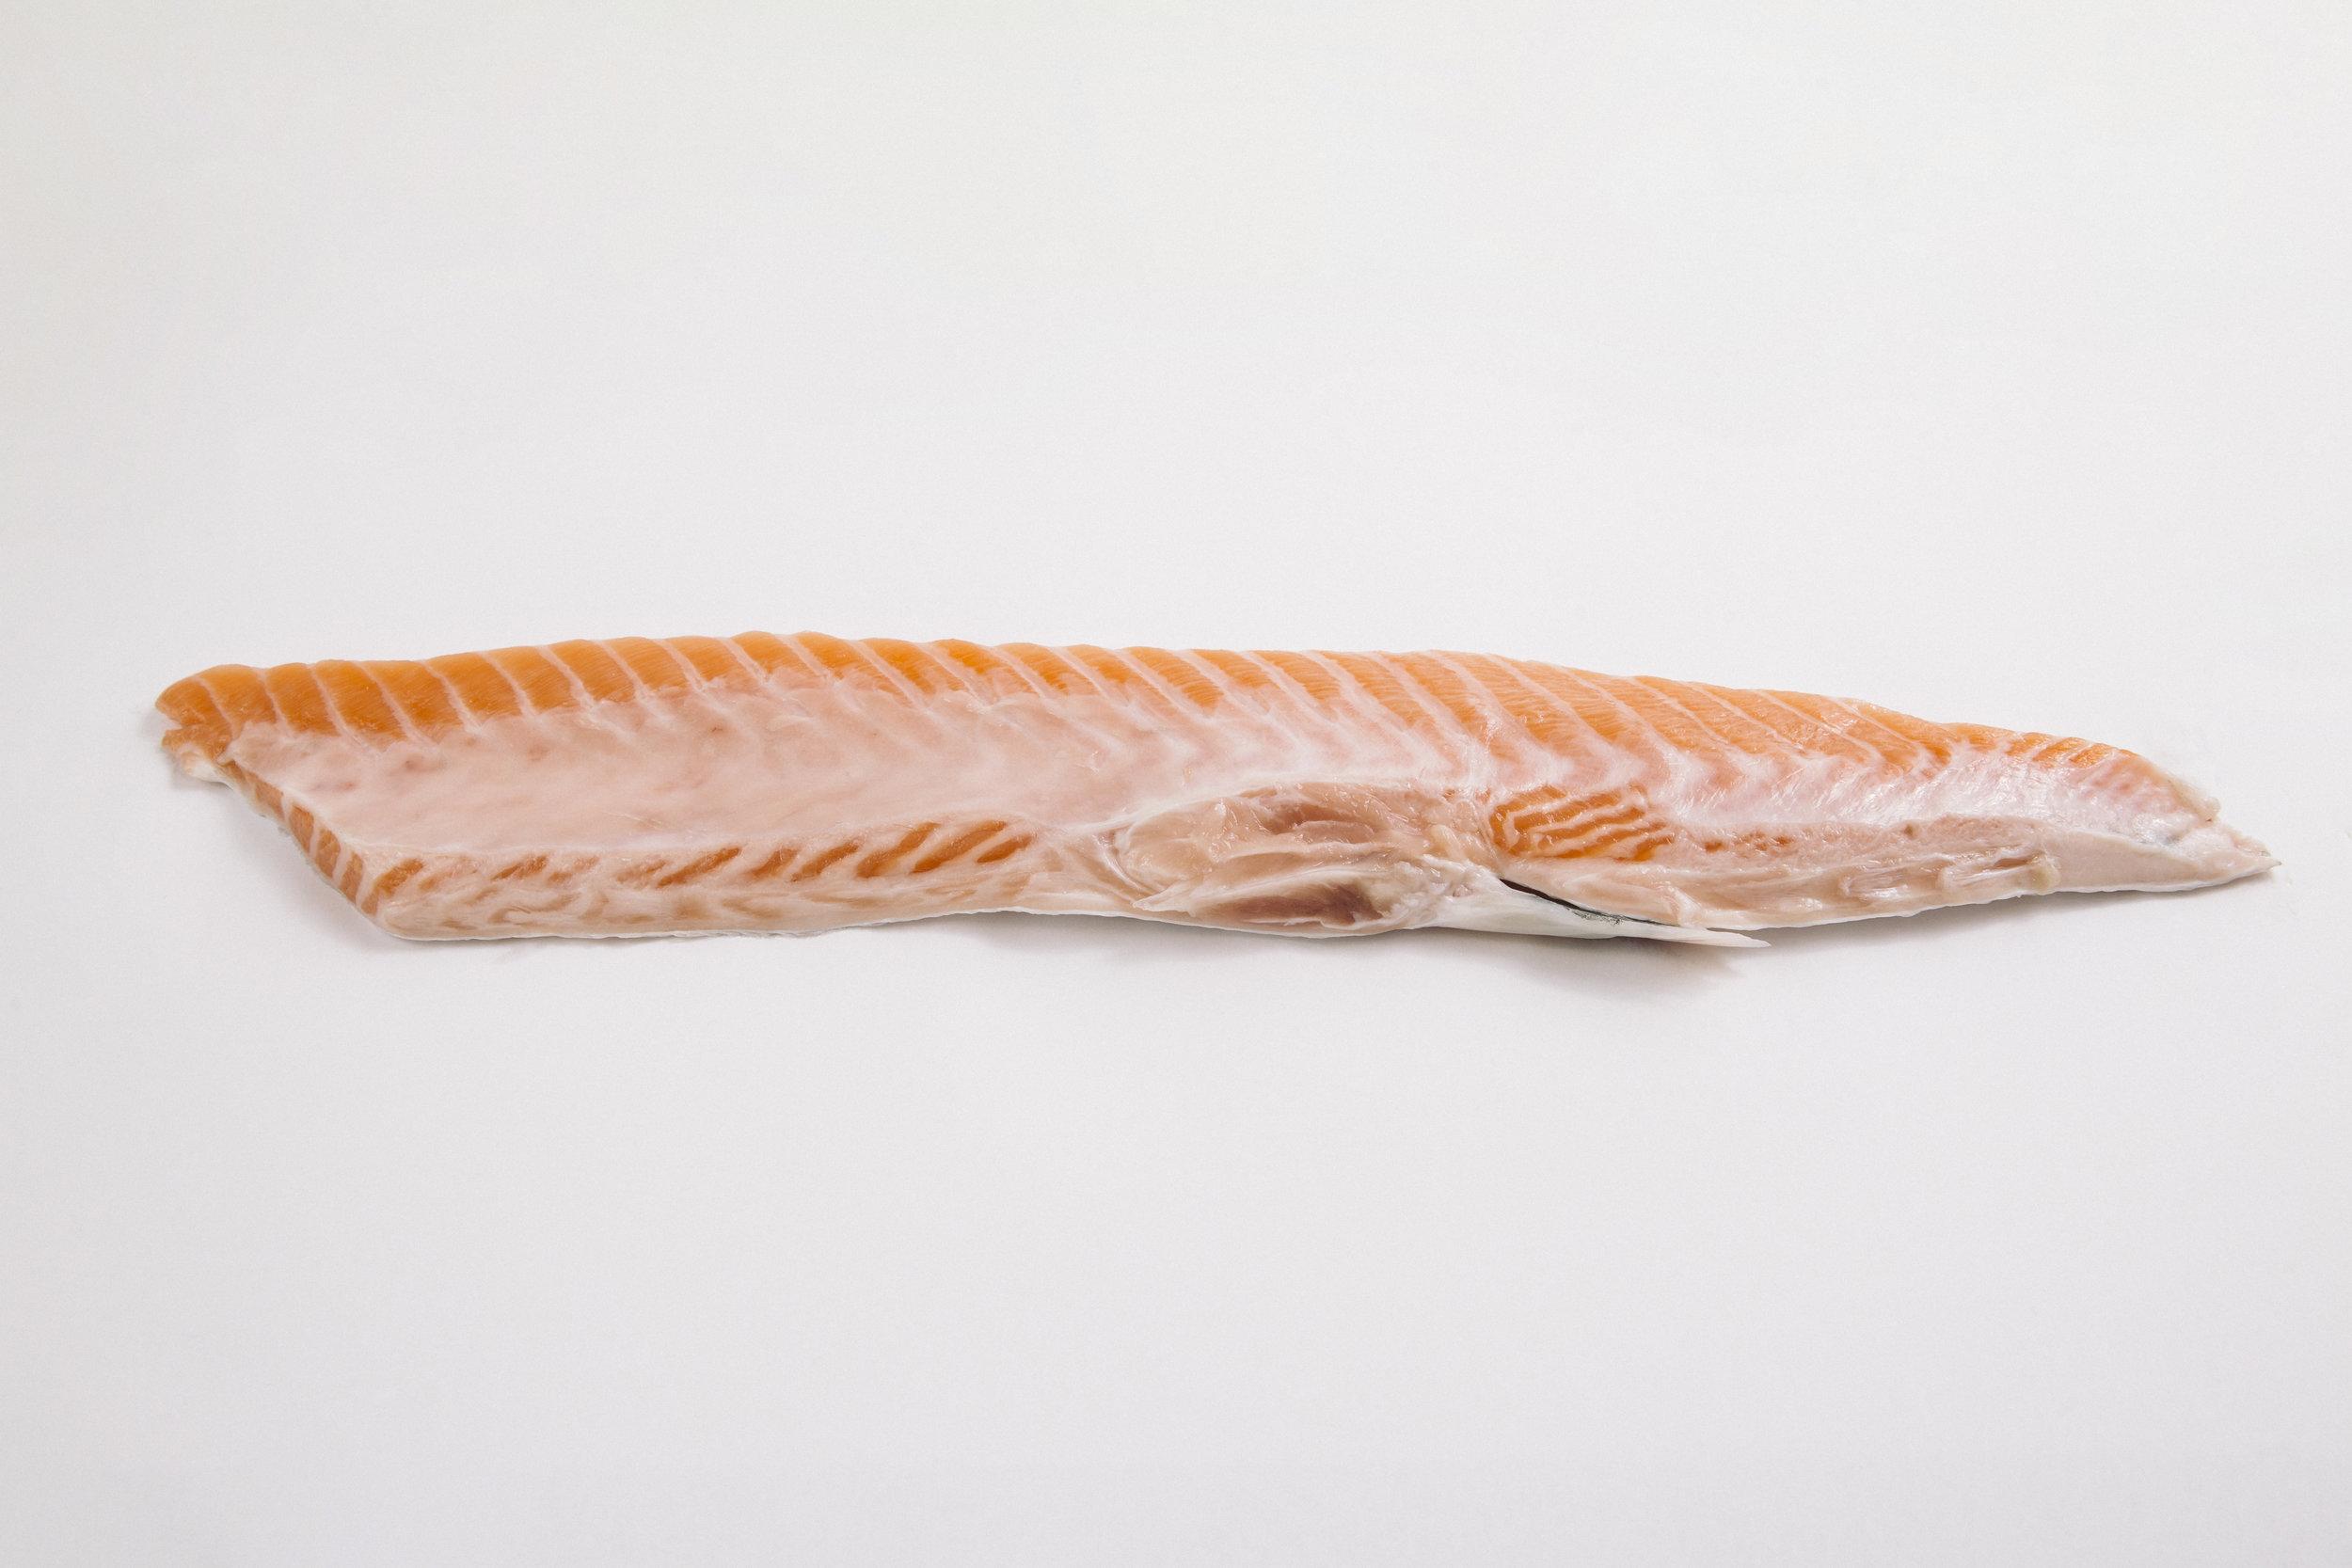 Belly flap  3 - 5cm, bulk pack 15kg